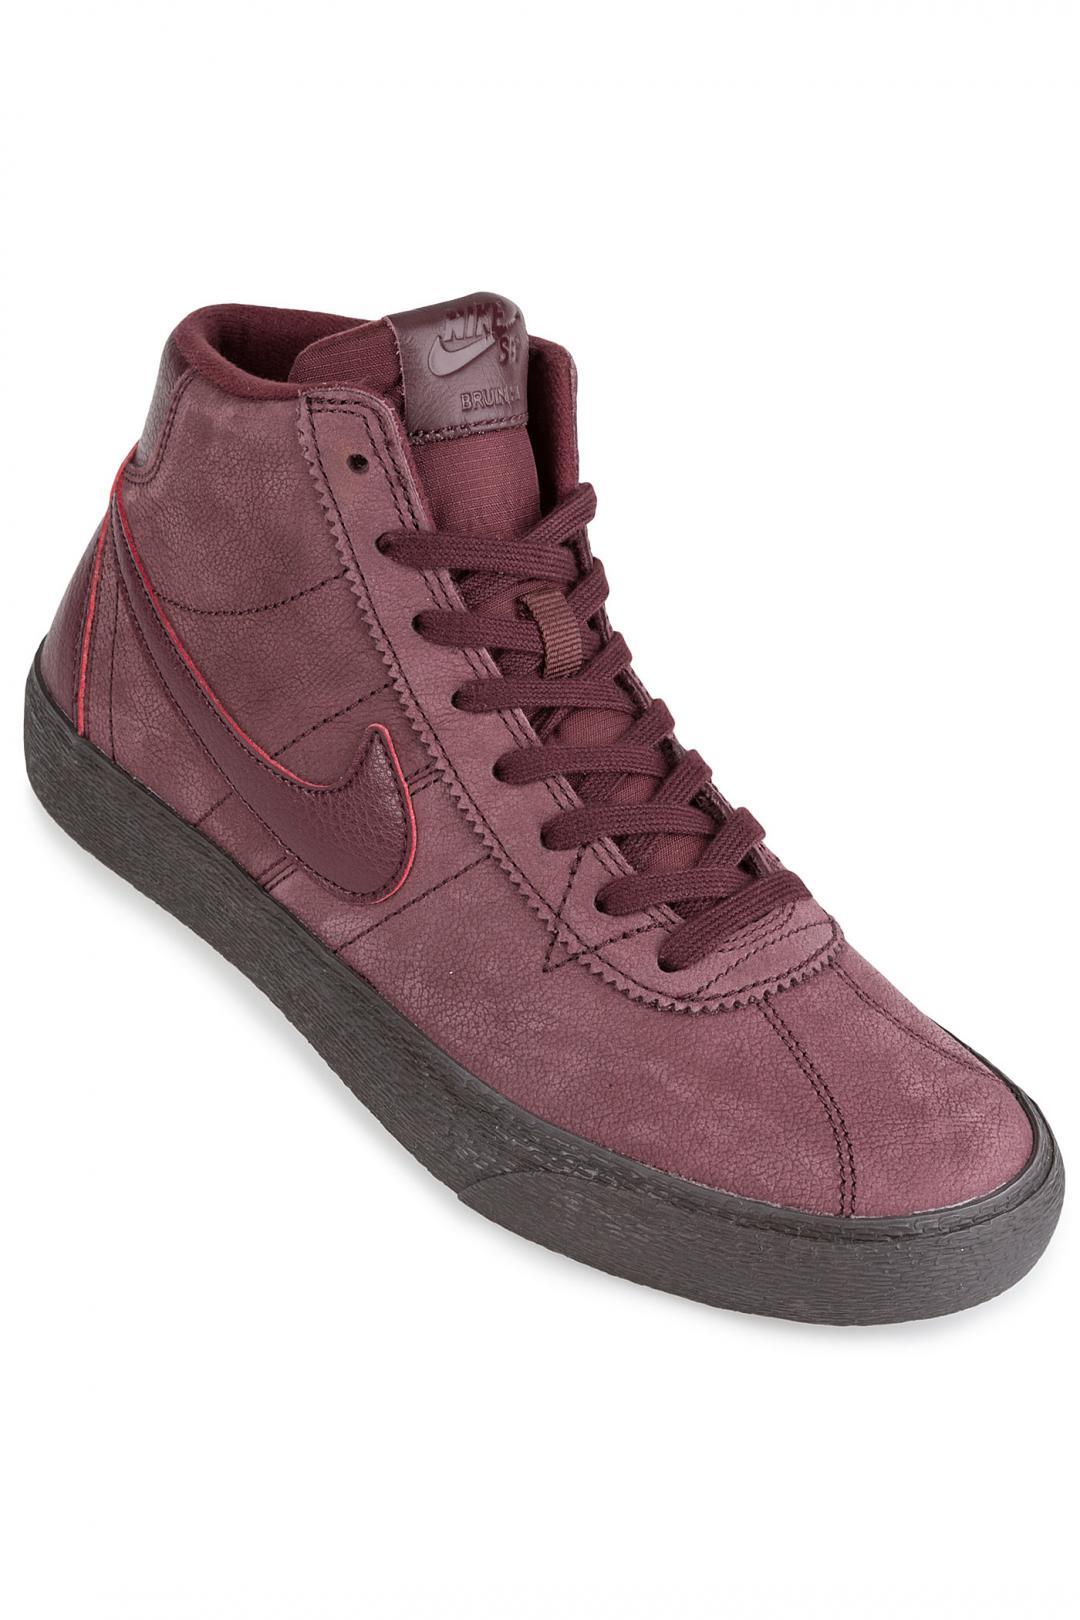 Donna Nike SB Bruin Hi burgundy crush | Scarpe da skate